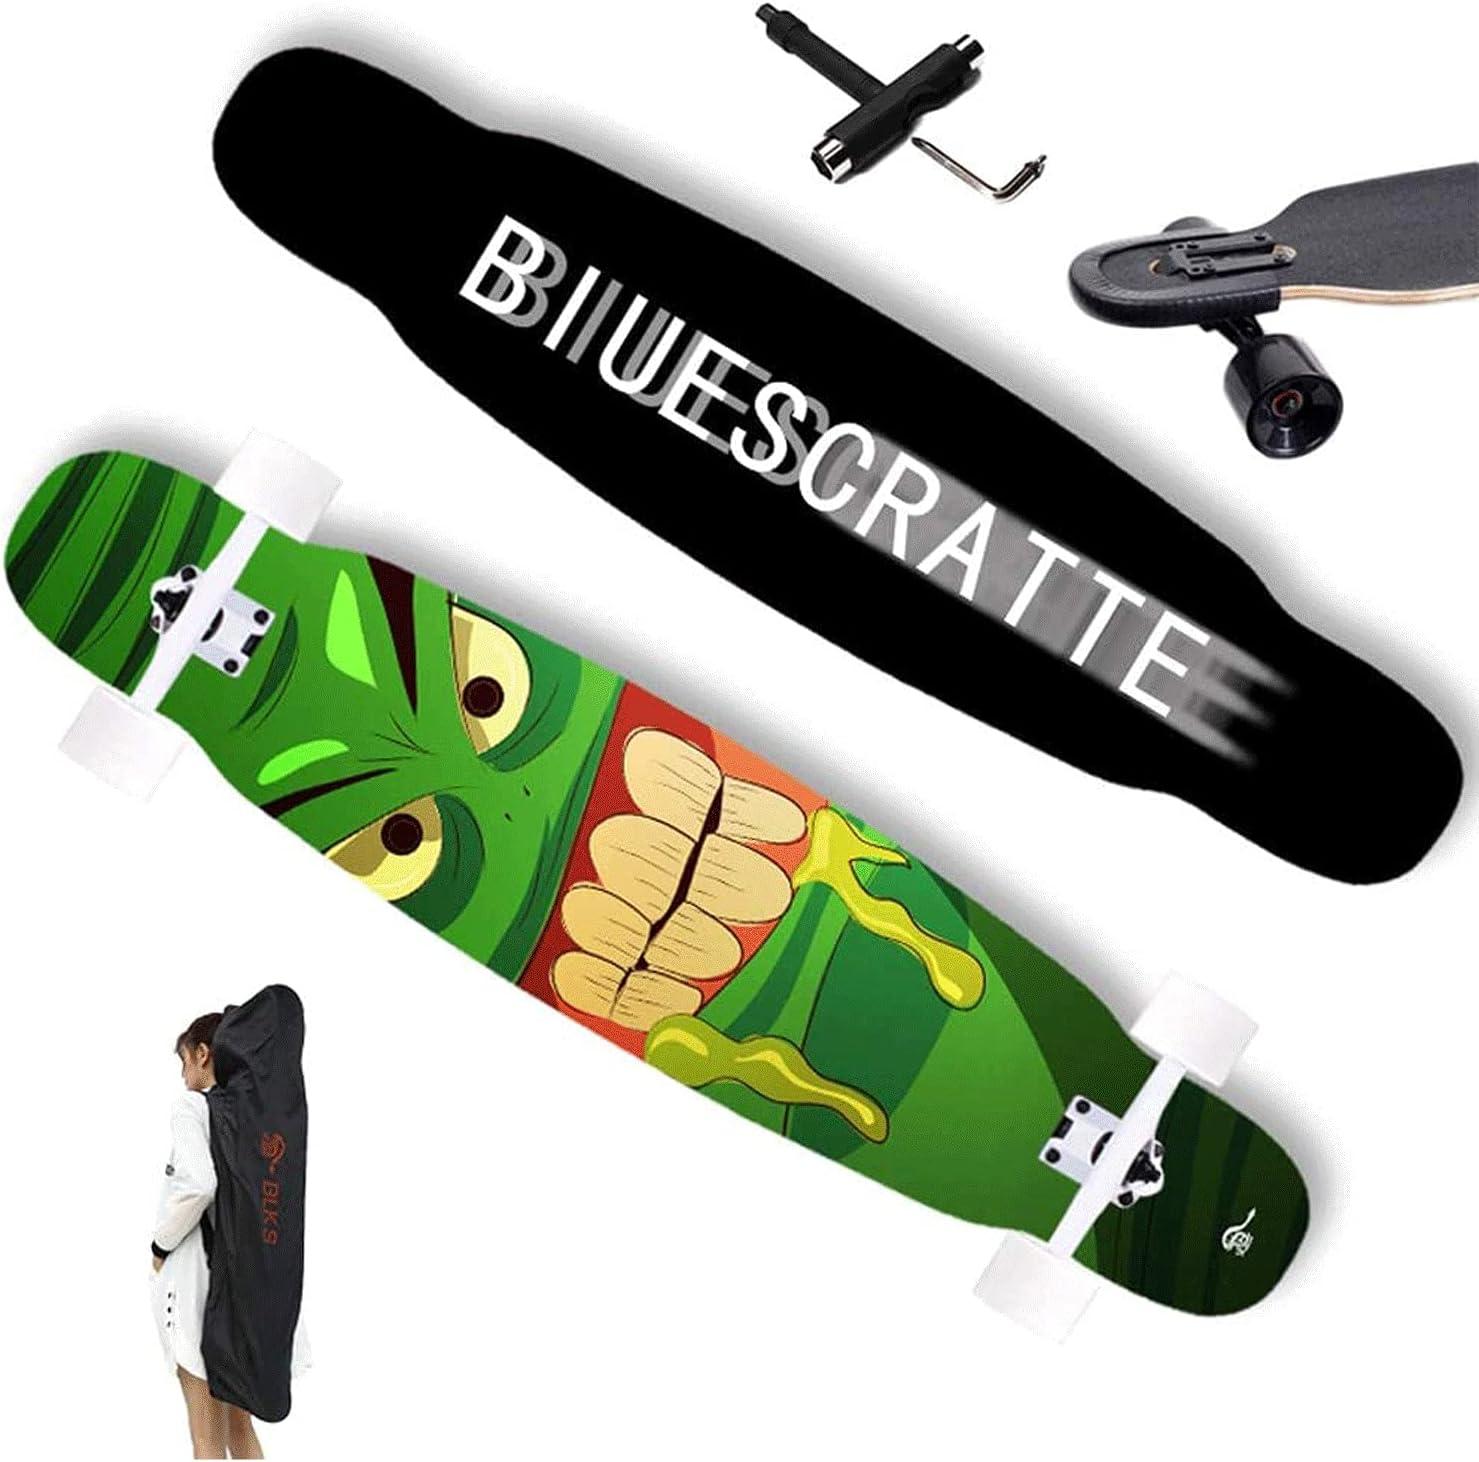 EEGUAI Max 63% OFF Skateboard Complete 7 Spring new work Layer Crui Longboard Maple